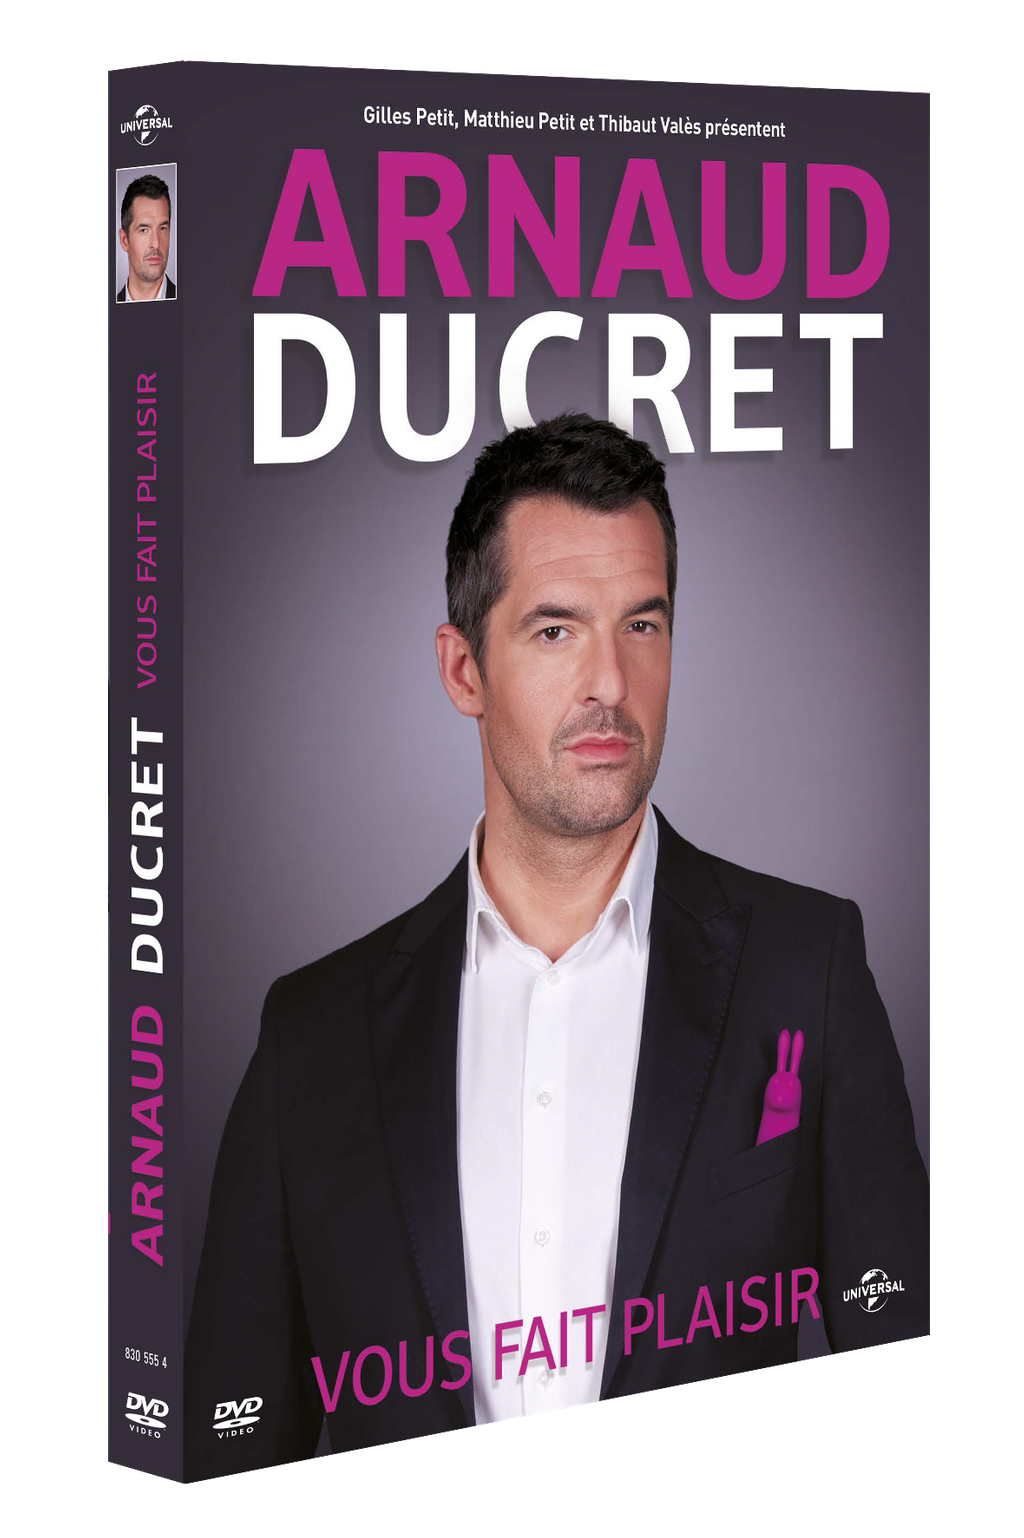 ducret1